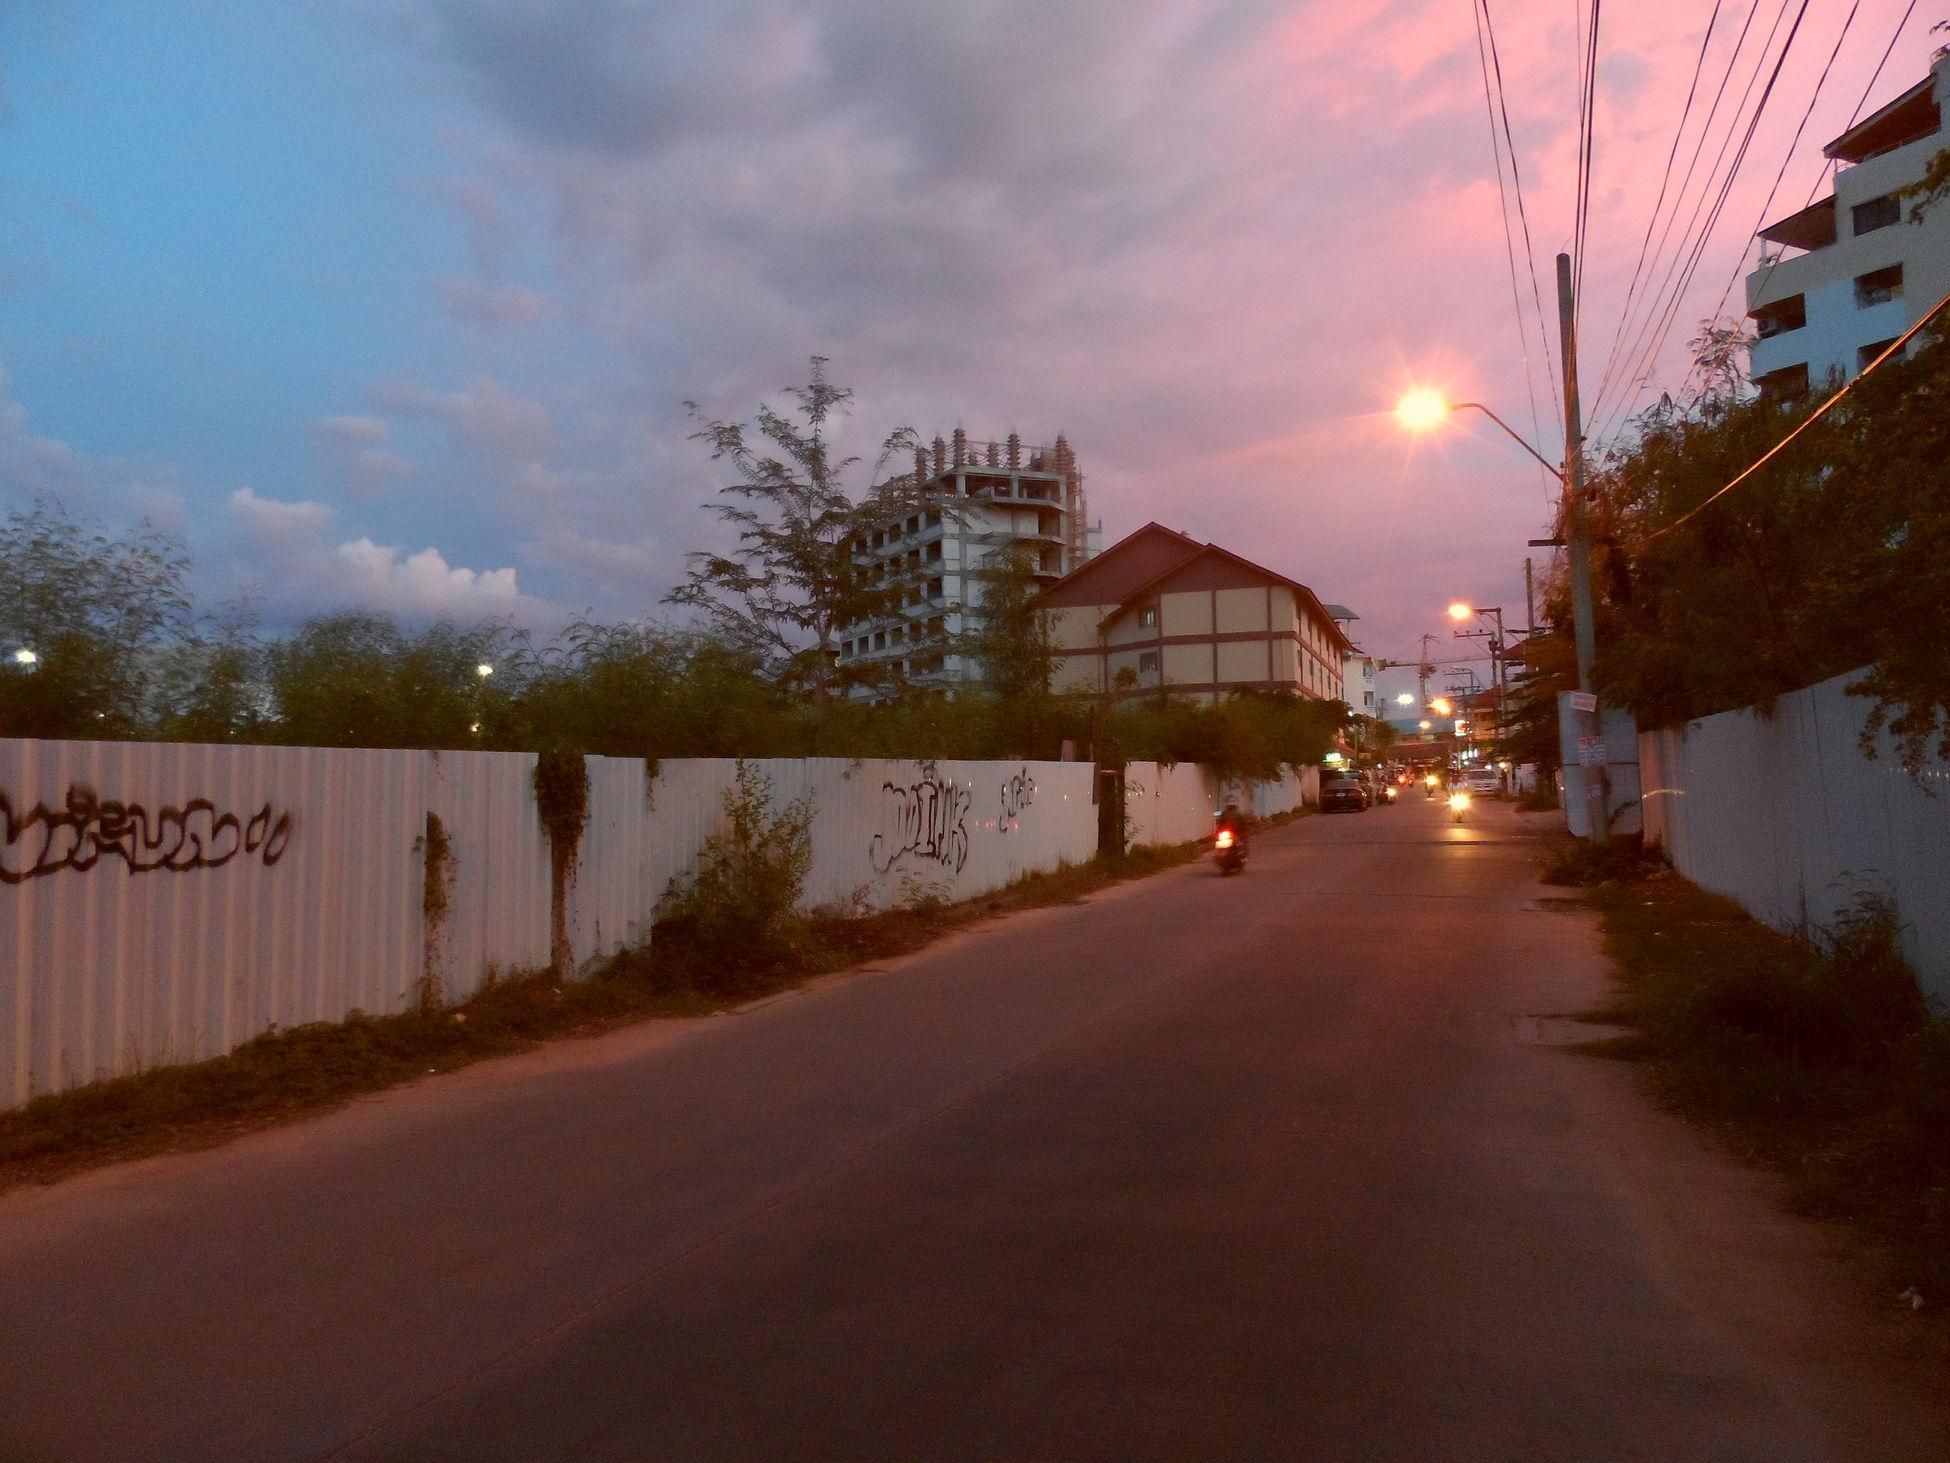 Neighbourhood at Dusk ..........Simple Life City